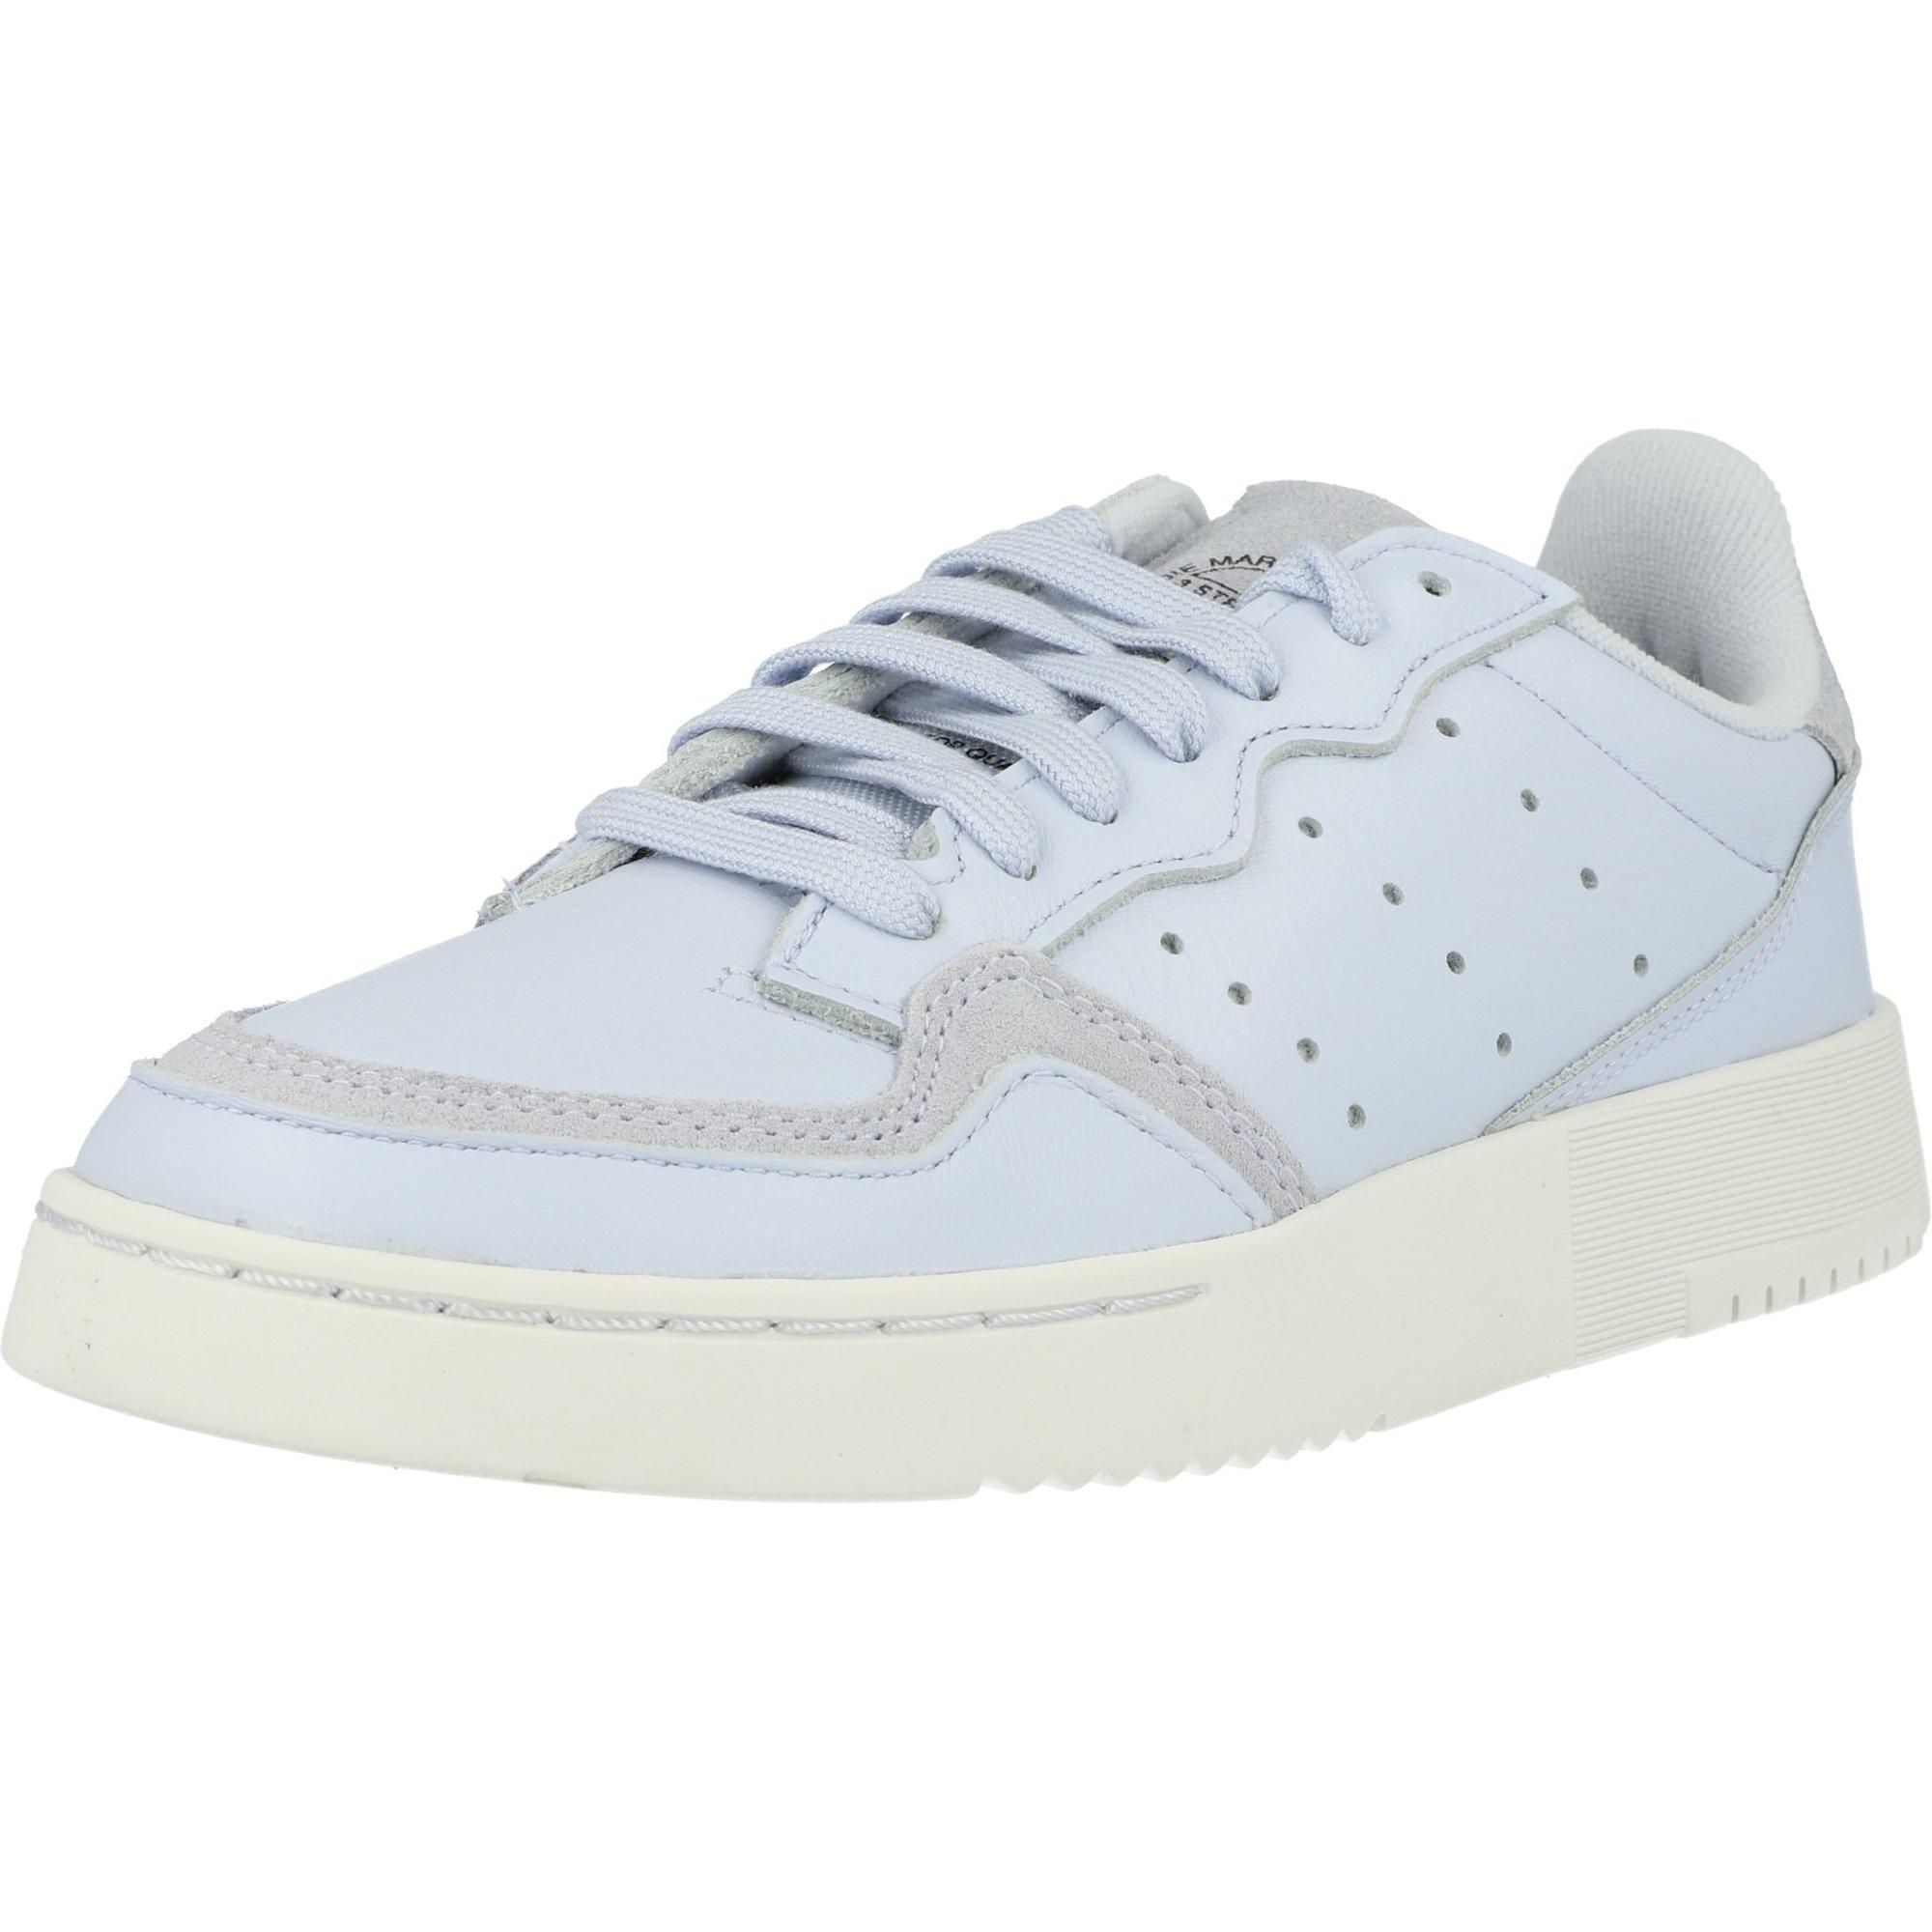 adidas Originals Supercourt J Aero BlueKristallweiß Leder Jugend